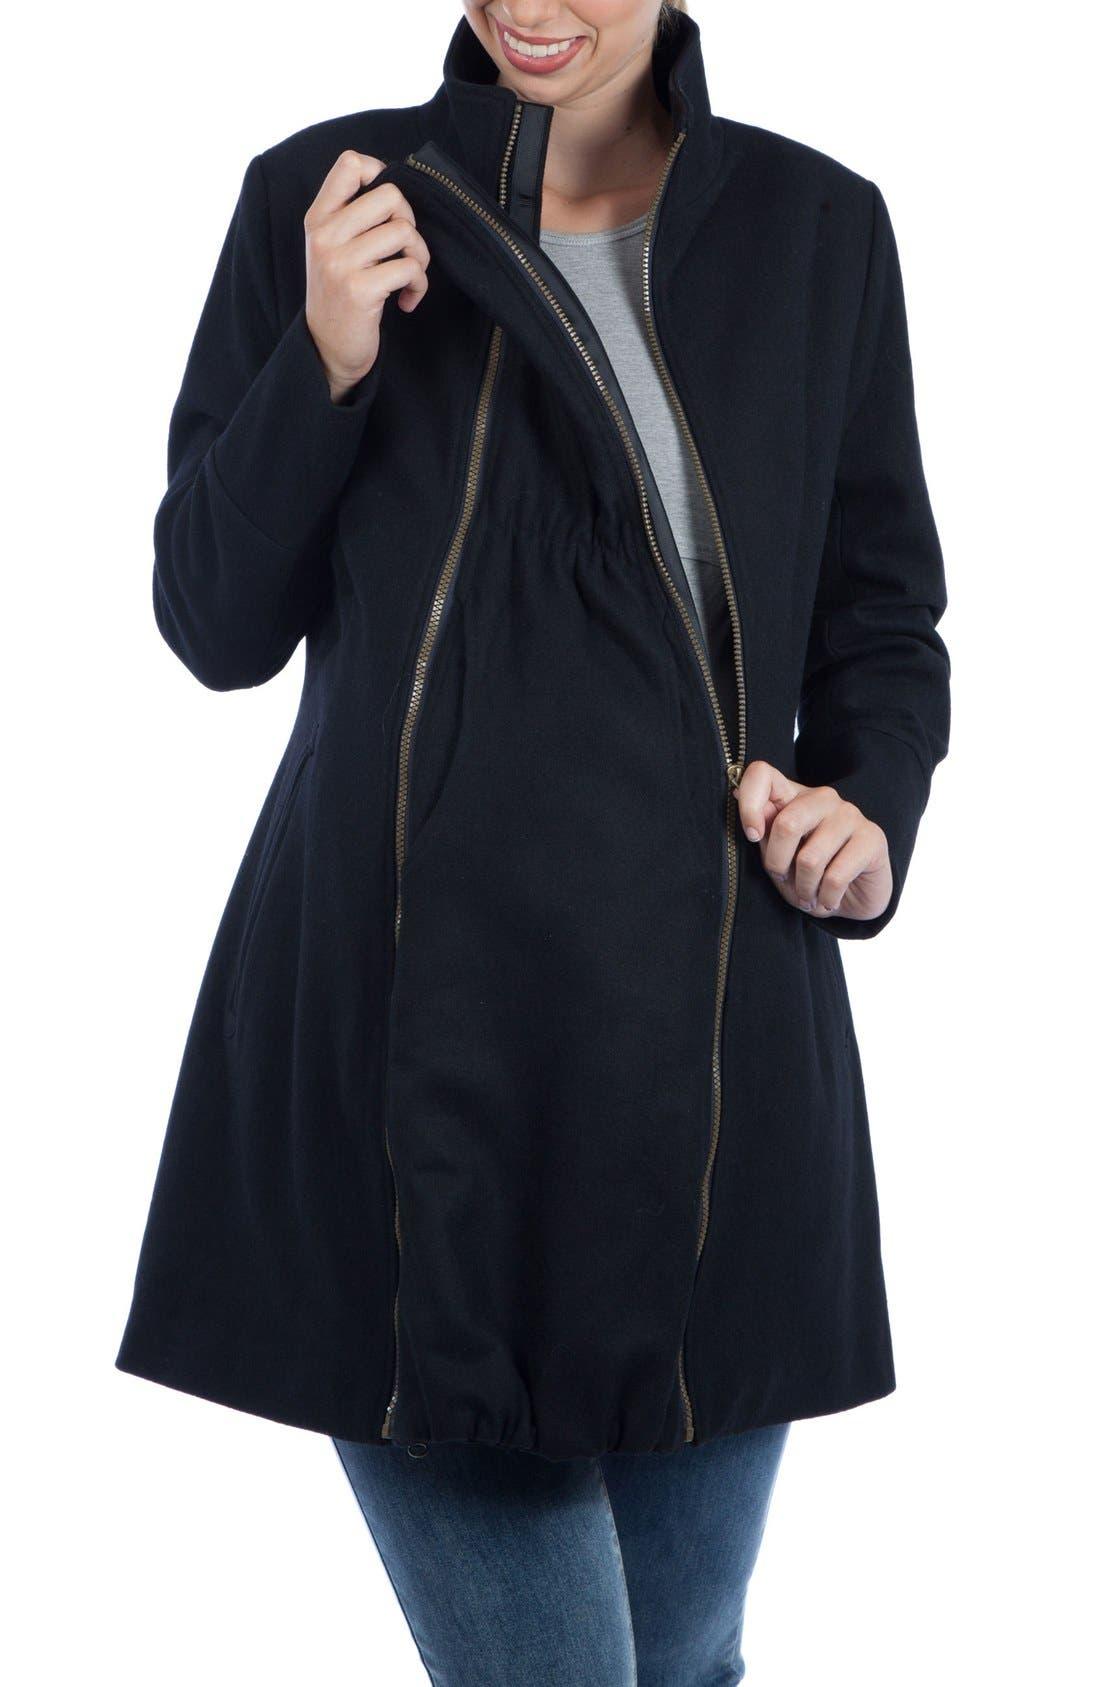 Convertible 3-in-1 Maternity/Nursing Coat,                             Alternate thumbnail 8, color,                             BLACK